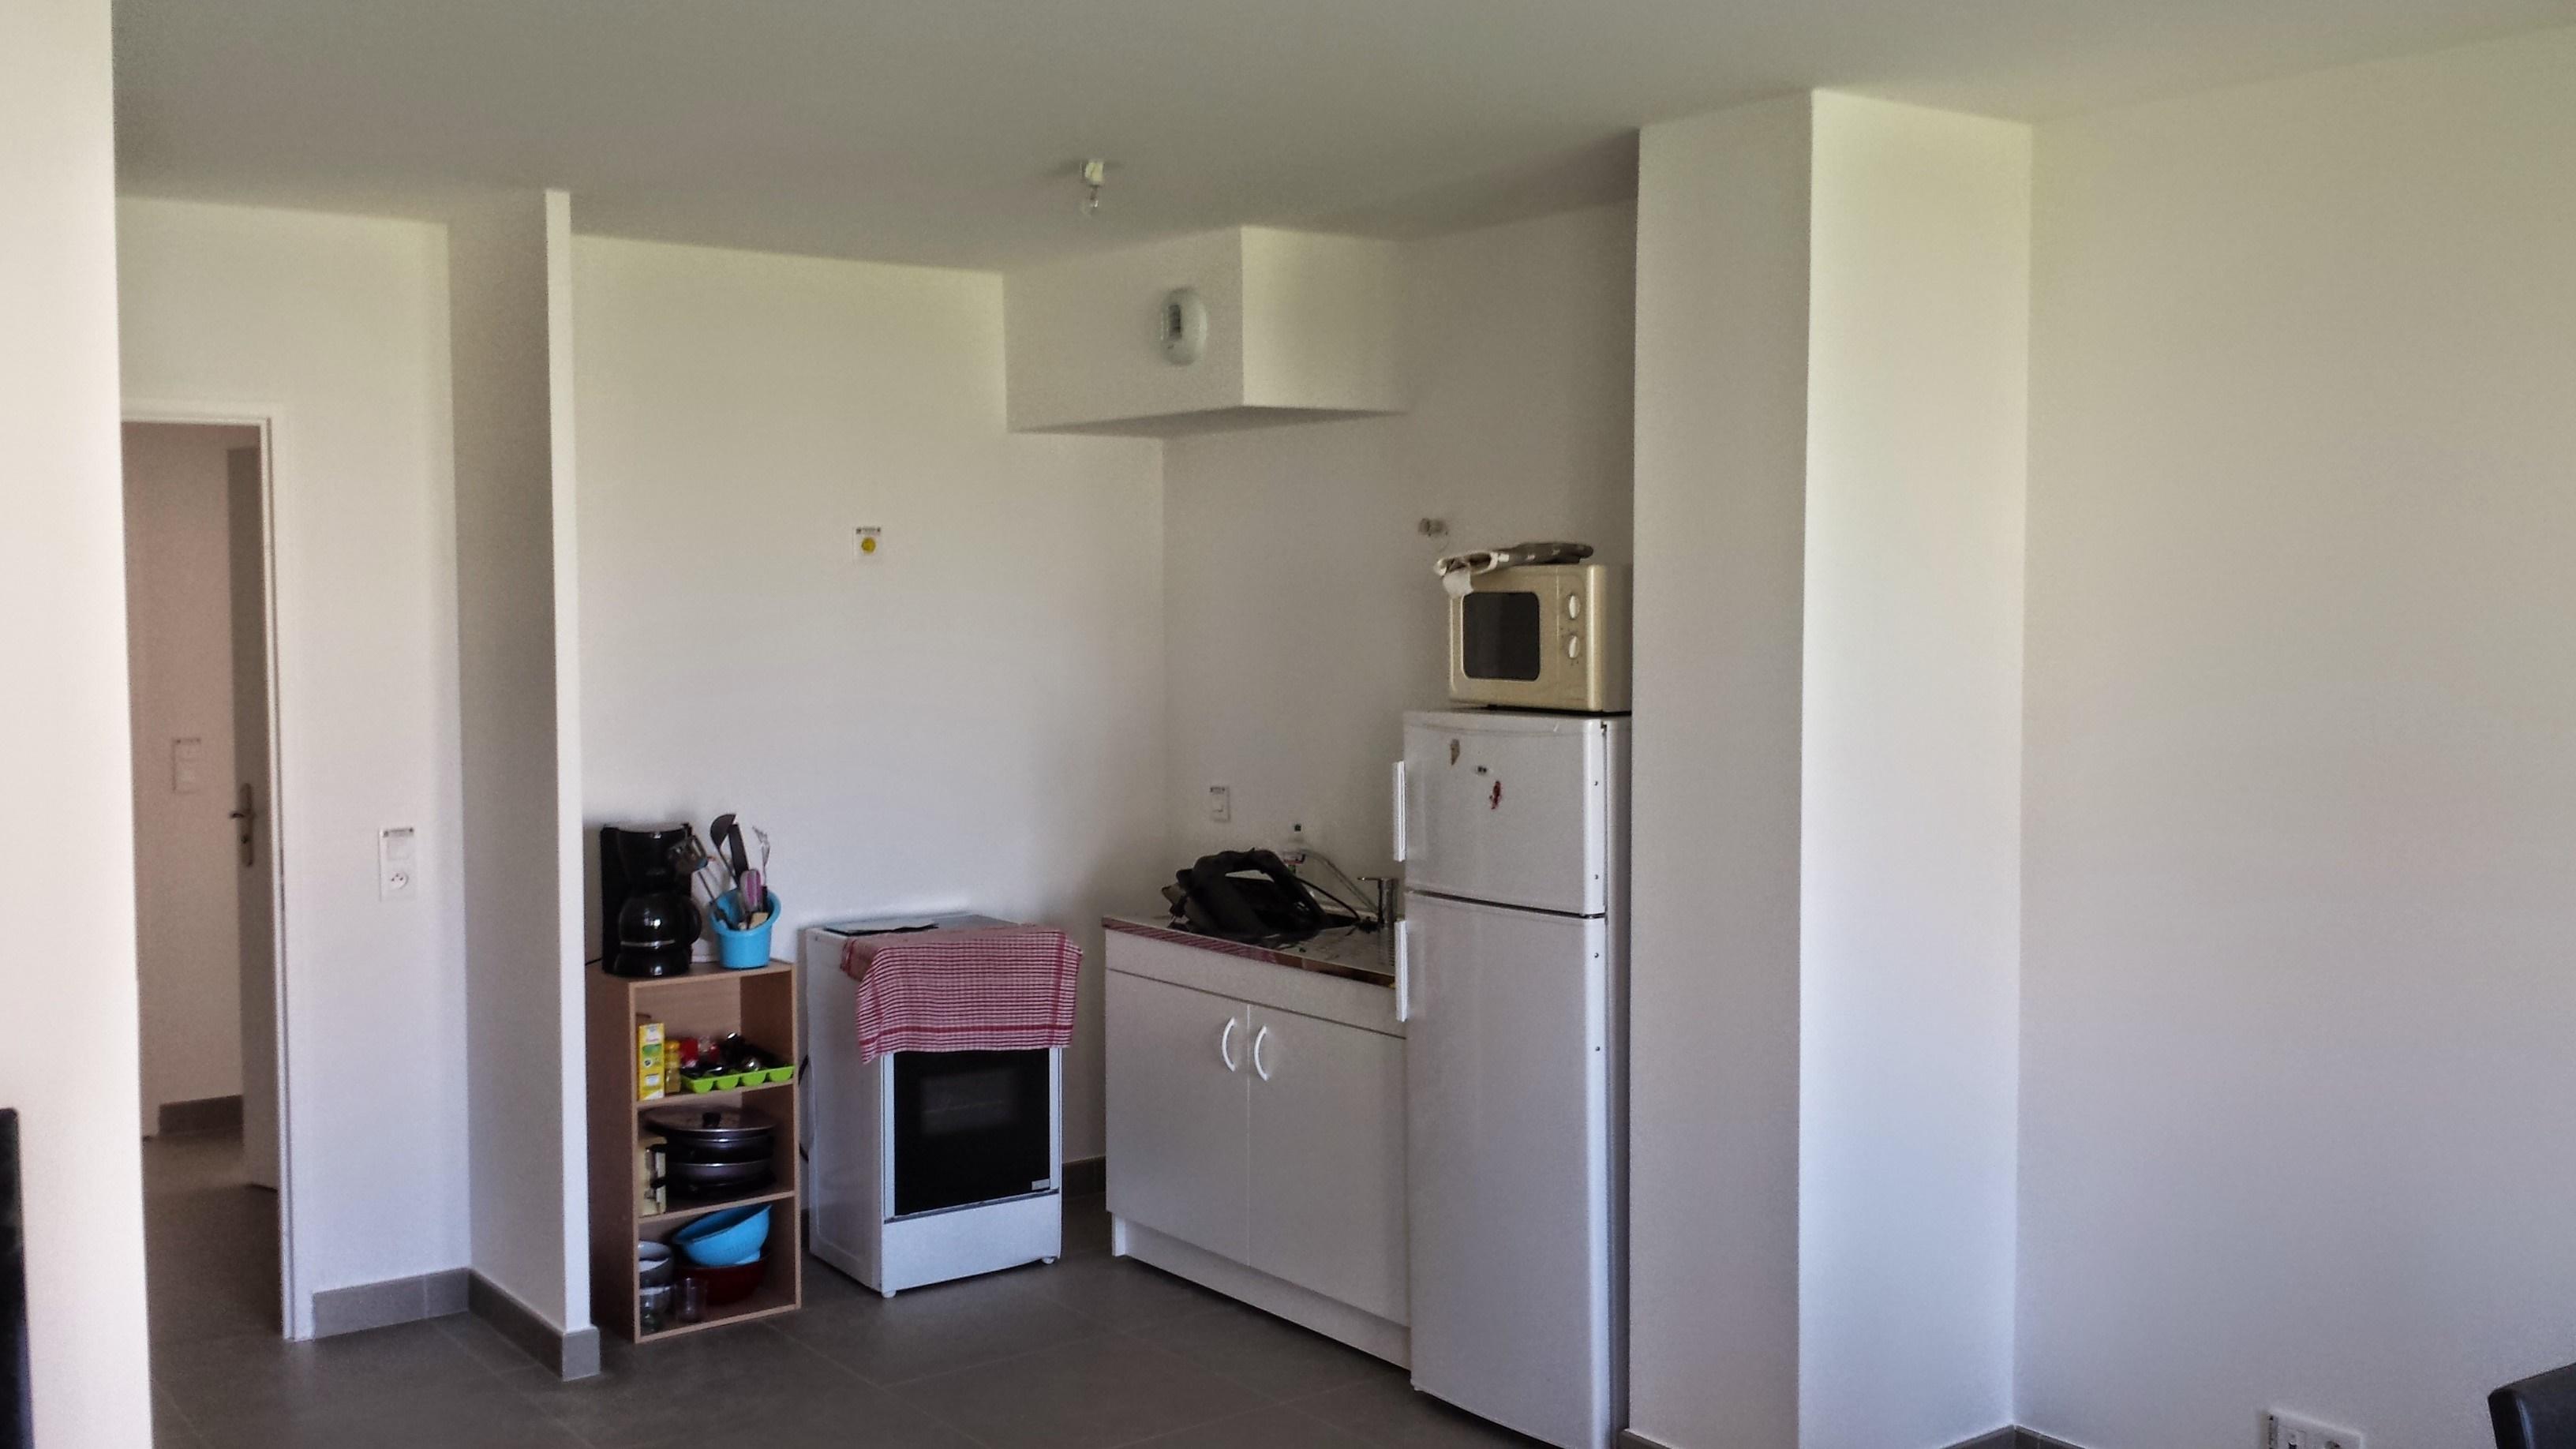 poseur de cuisine formation poseur de cuisine new accueil with poseur de cuisine great cuisine. Black Bedroom Furniture Sets. Home Design Ideas